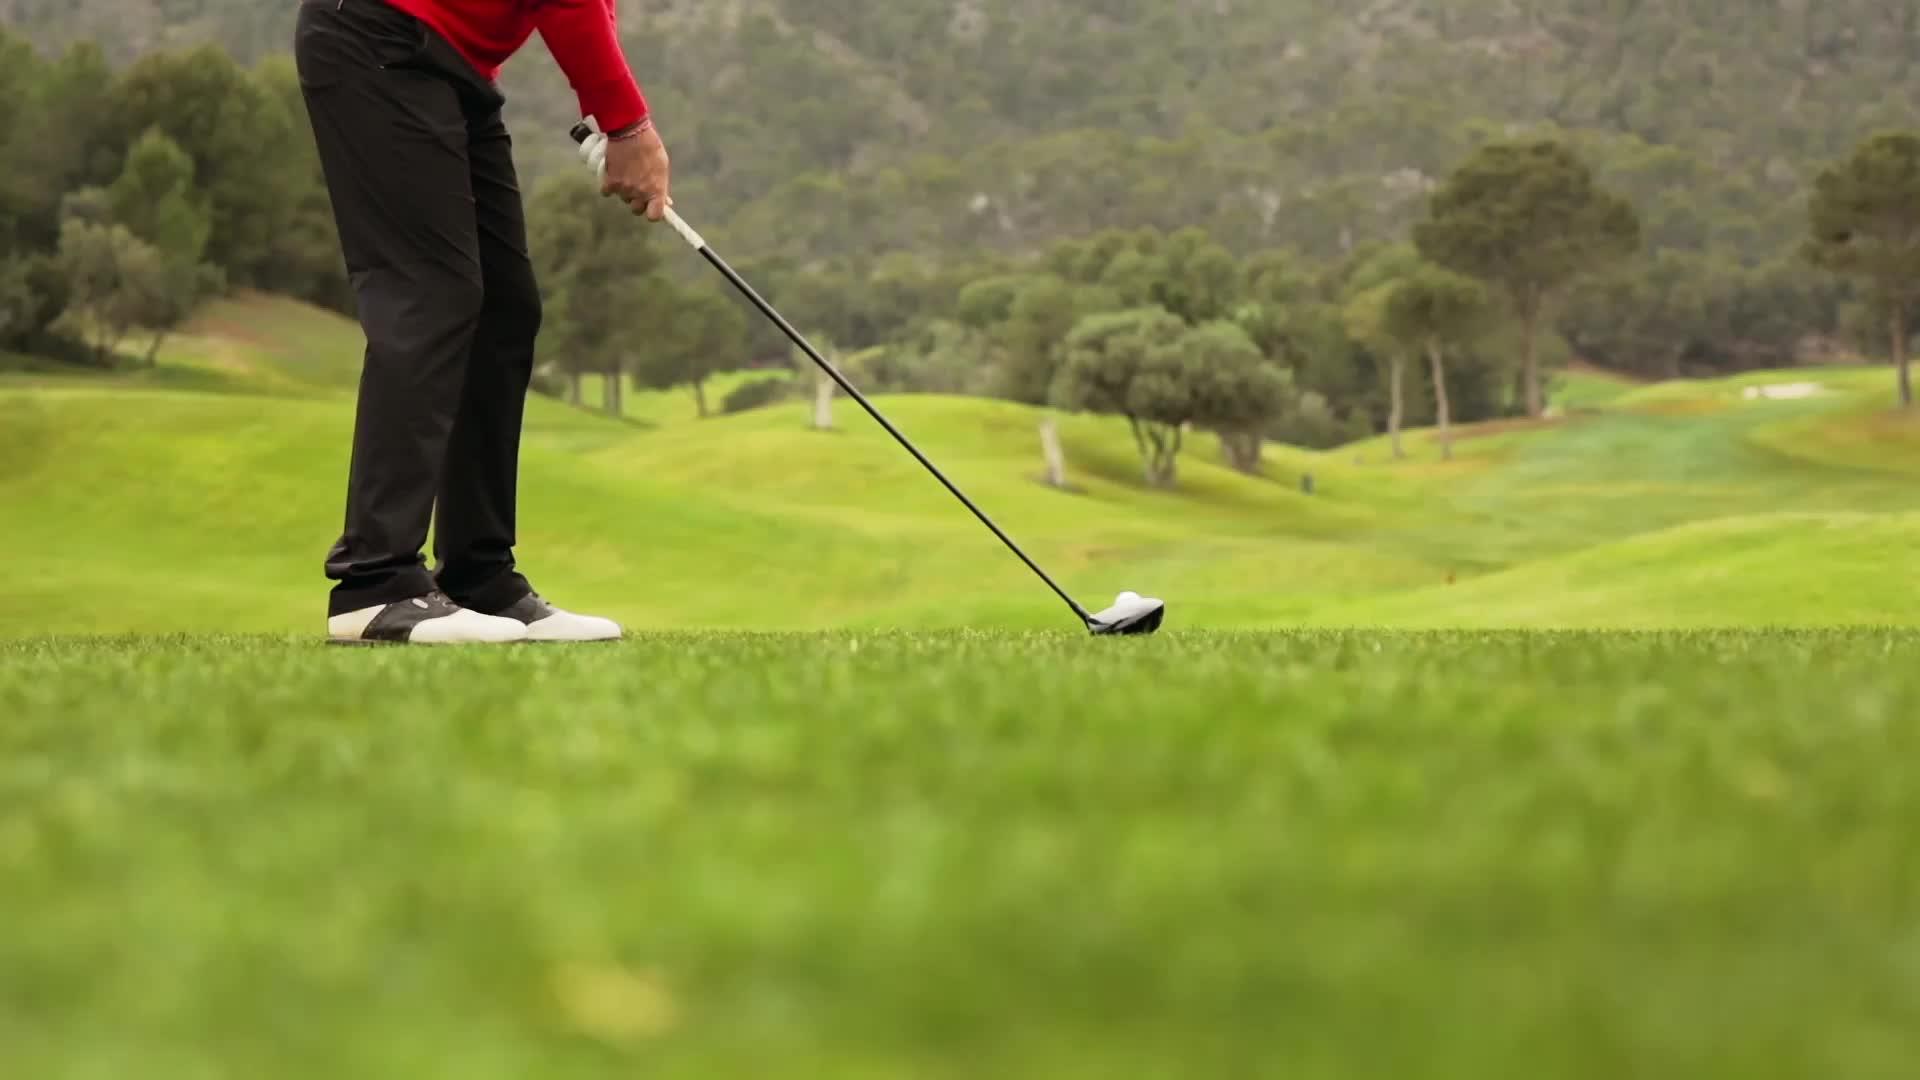 giocare a golf minorca